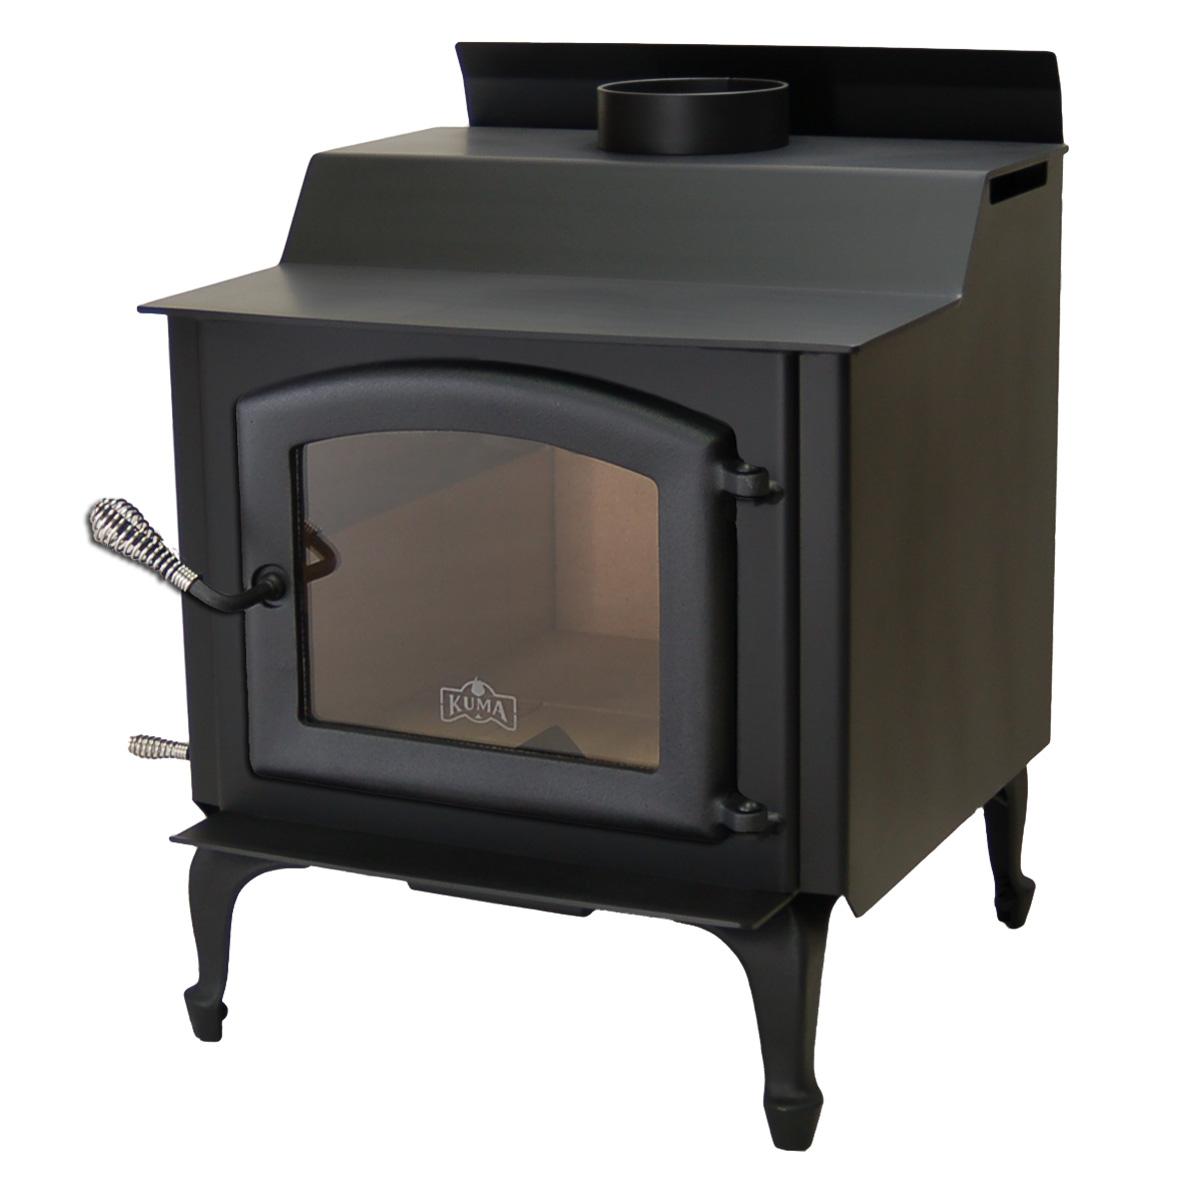 tamarack wood stove and fireplace from kuma stoves